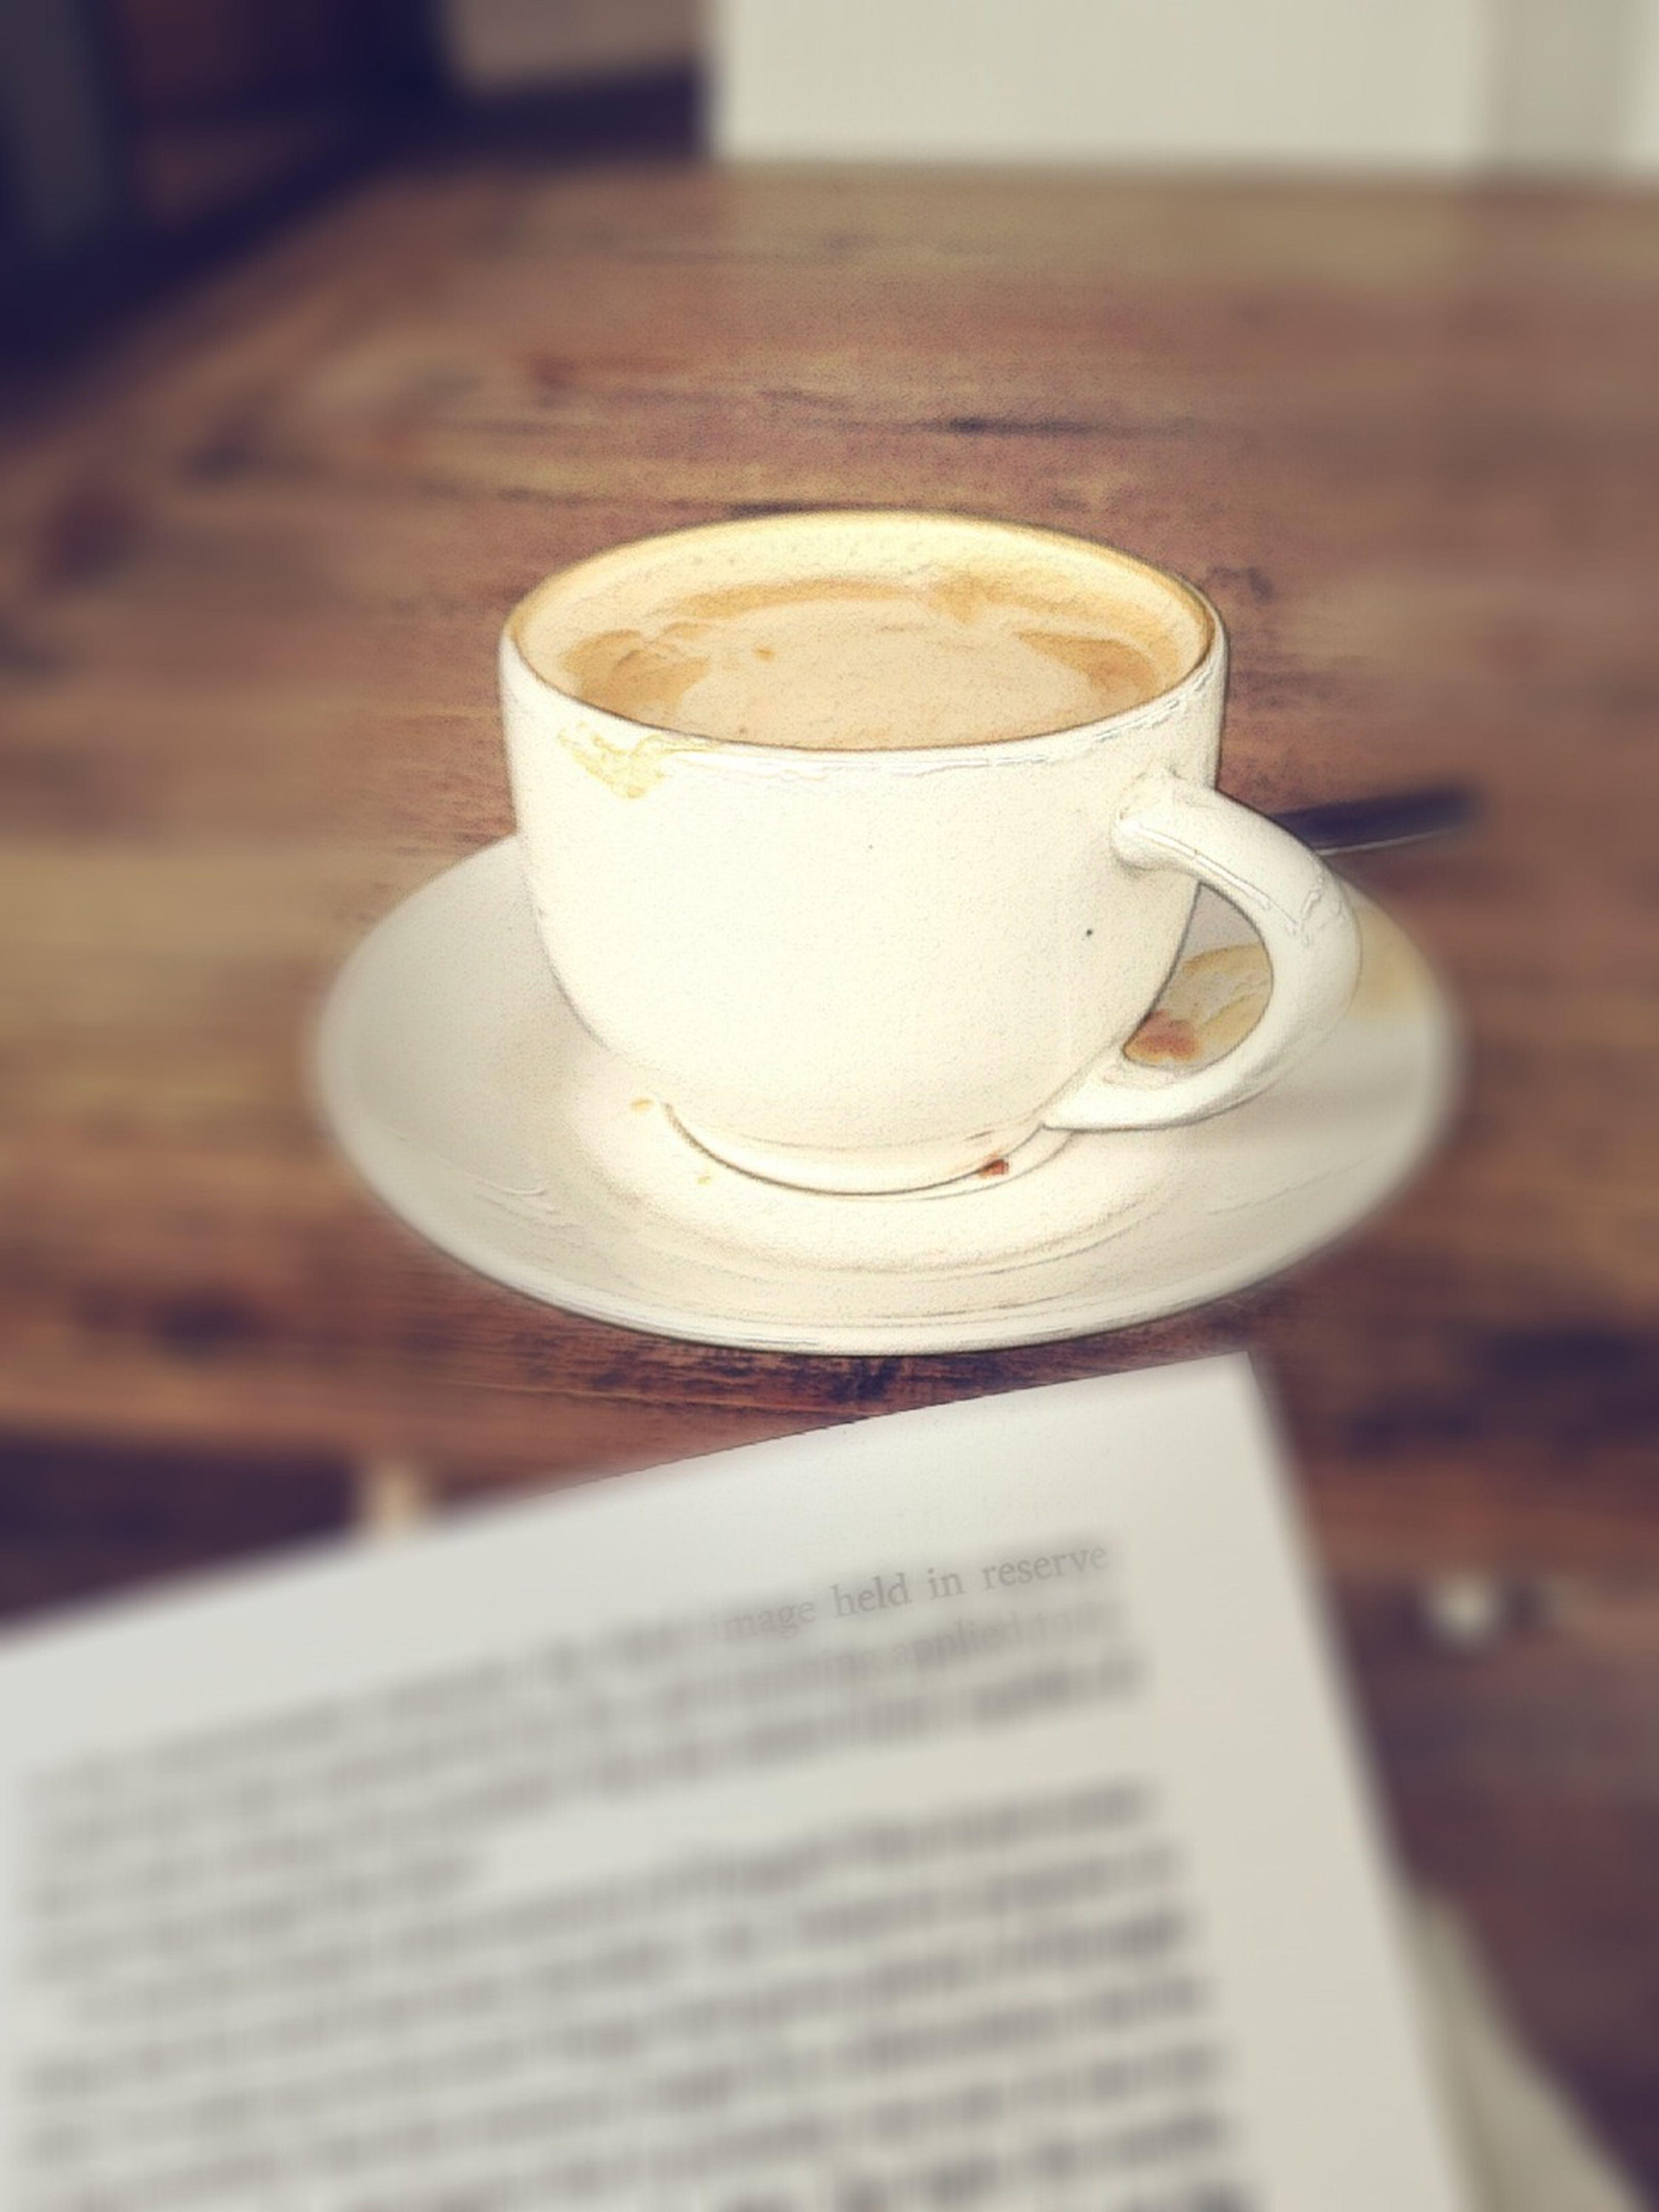 Sore gerimis, cappuccino, buku. Sempurna! Dailycious Coffee Reading A Book